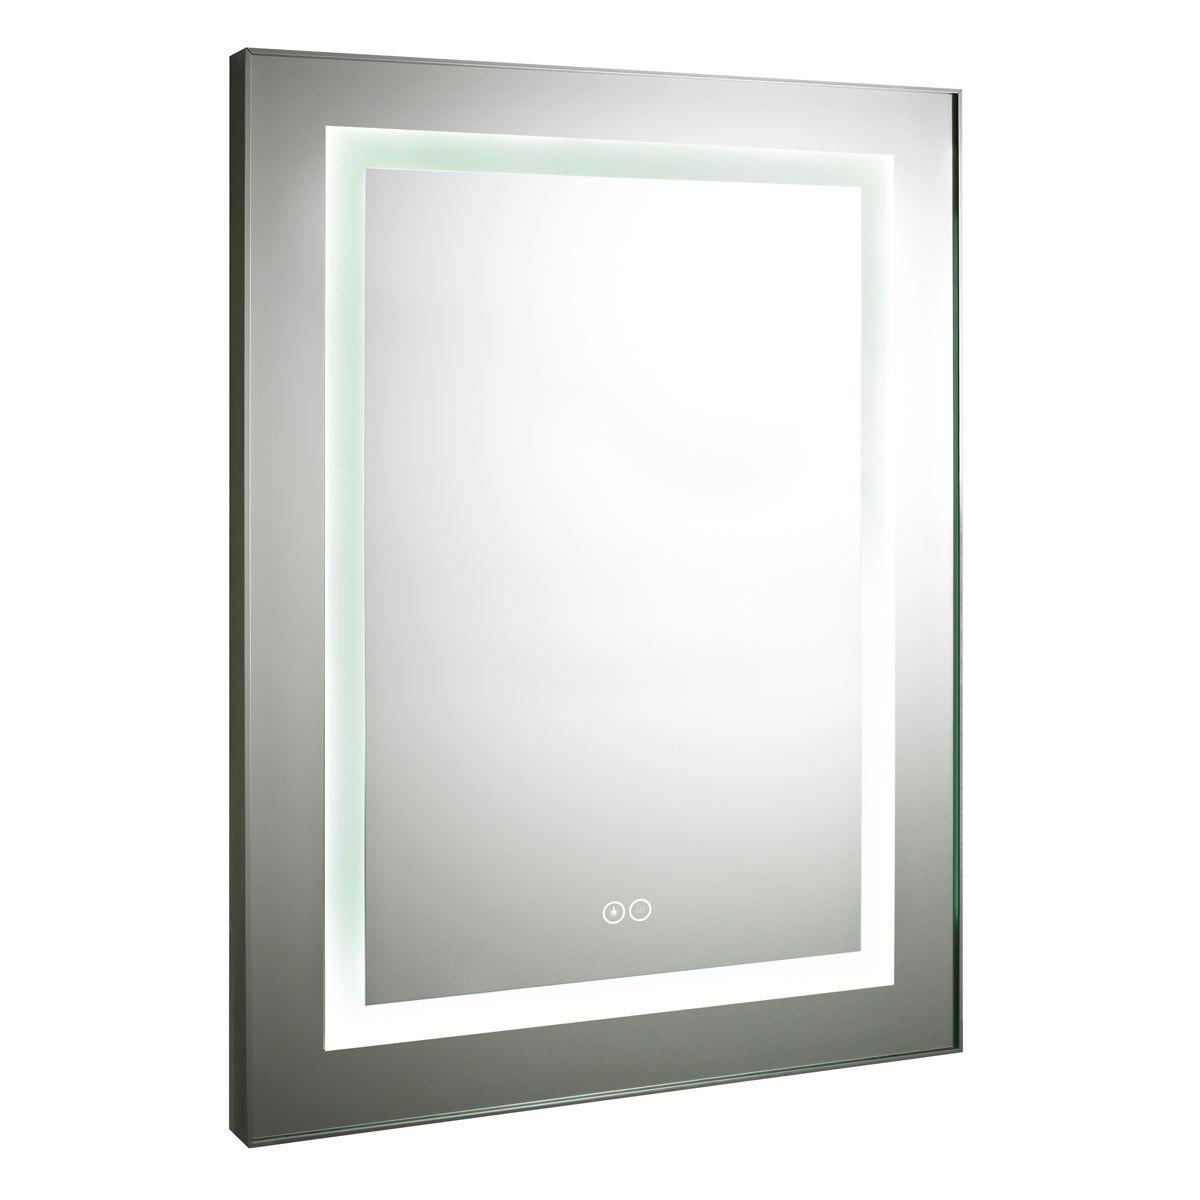 Nuie Level Touch Sensor Backlit Bathroom Mirror 800 x 600mm